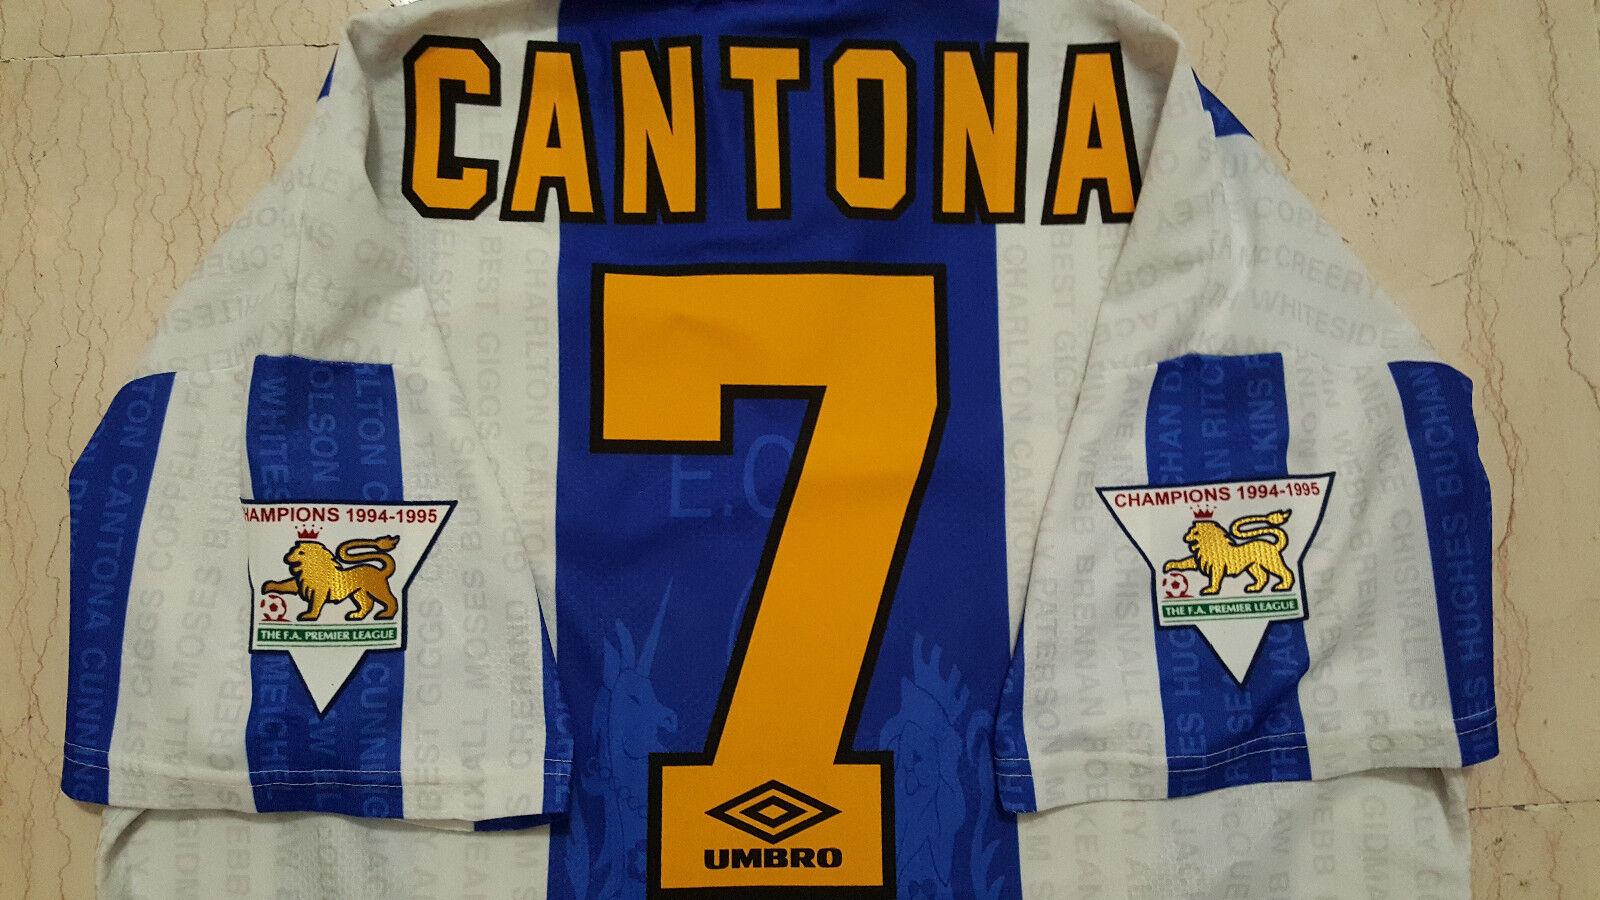 Maglia Cantona Manchester United Umbro champions 1994-95 shirt jersey vintage